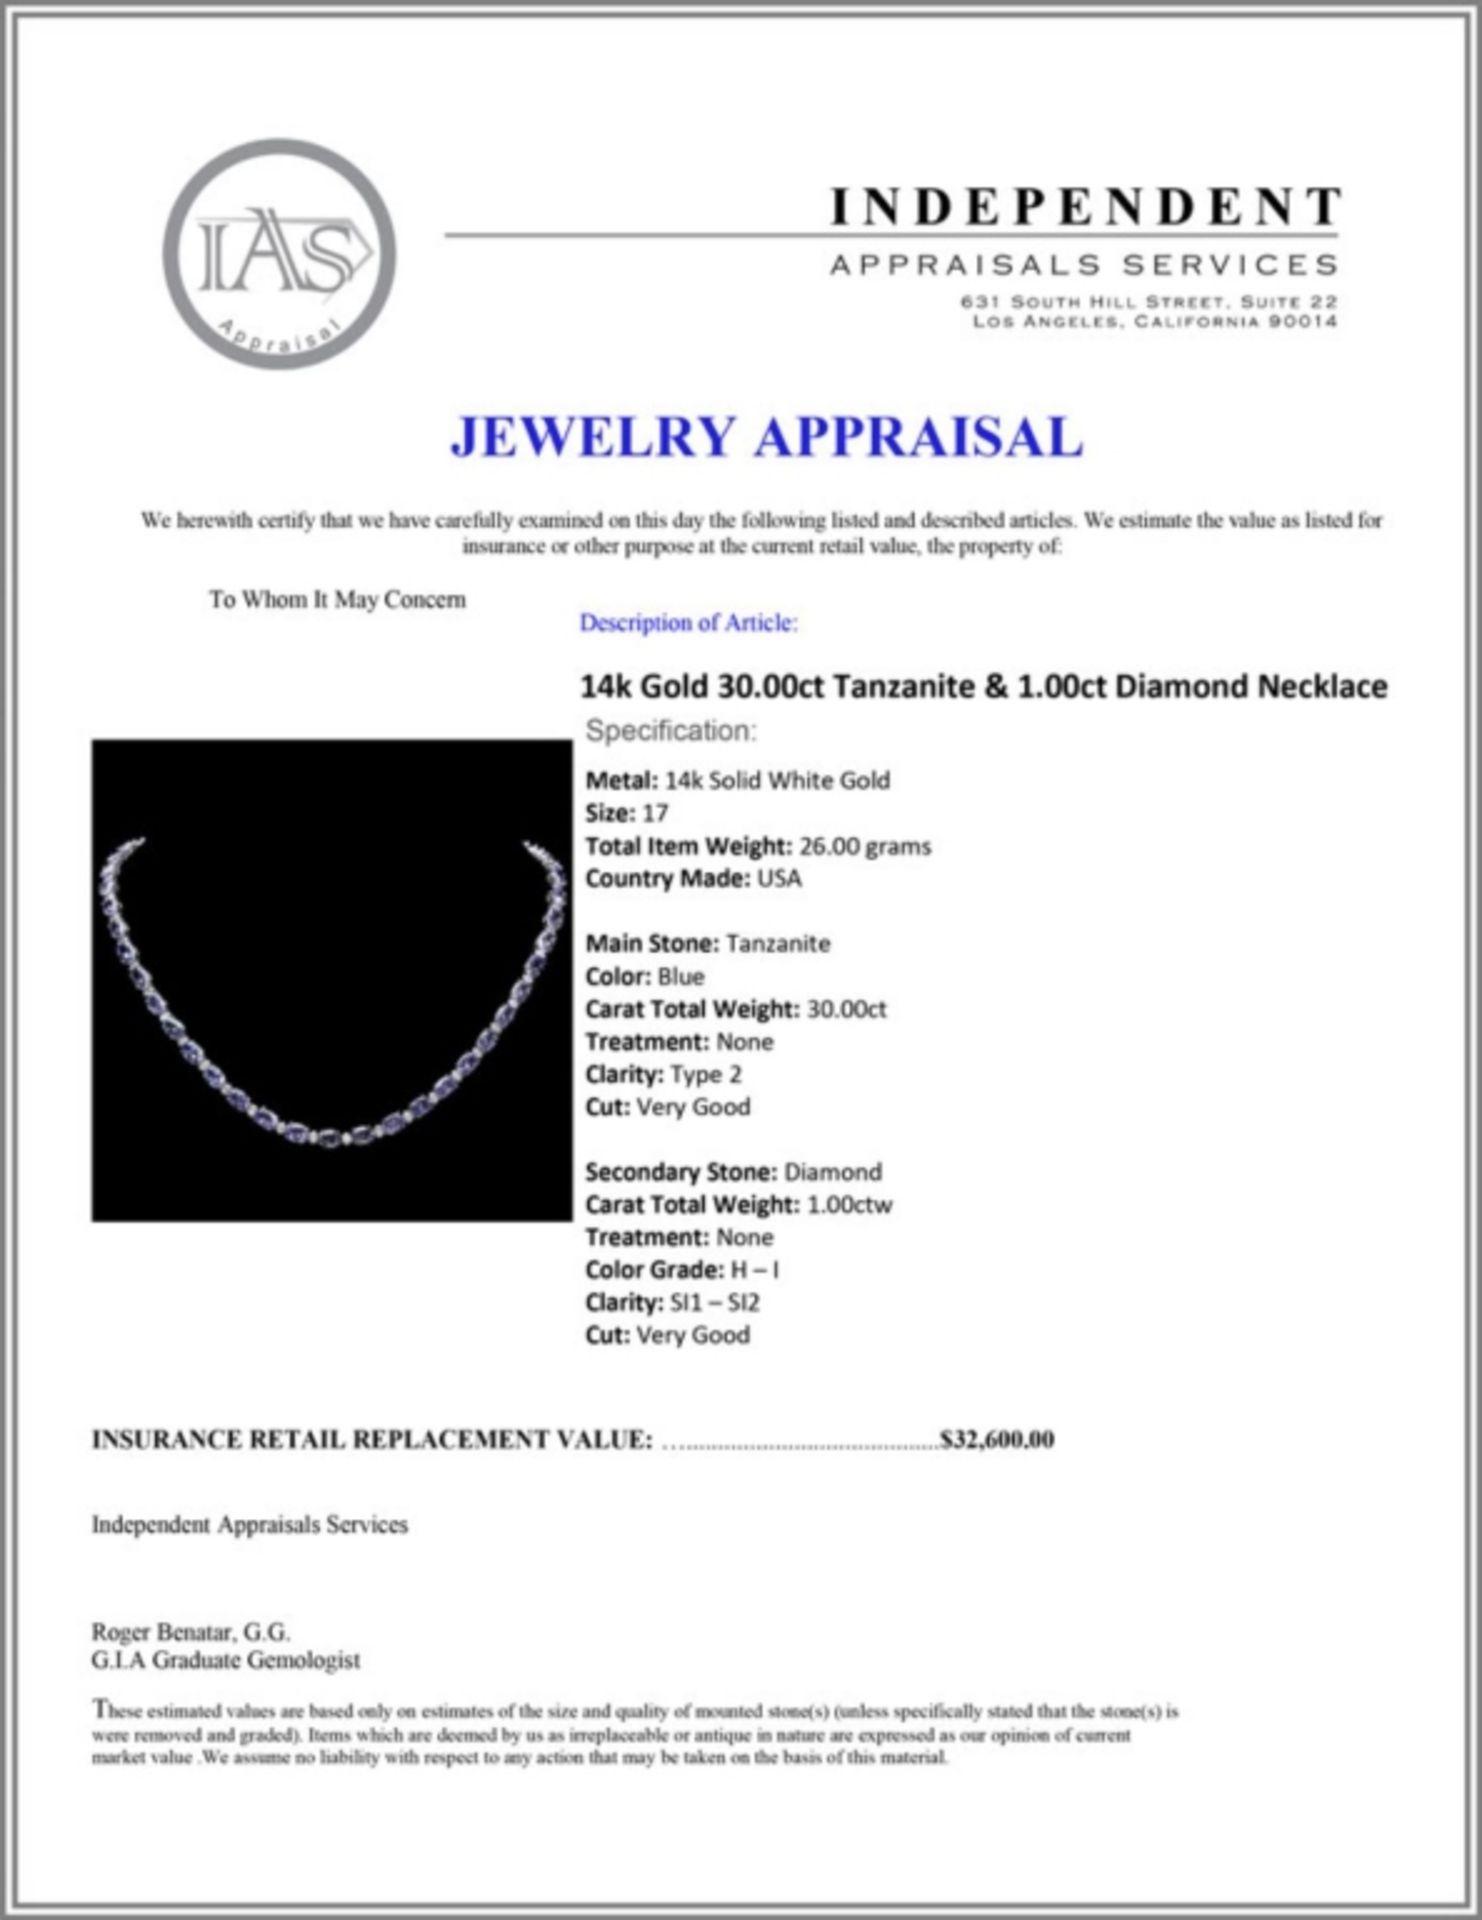 `14k Gold 30.00ct Tanzanite & 1.00ct Diamond Neckl - Image 3 of 3